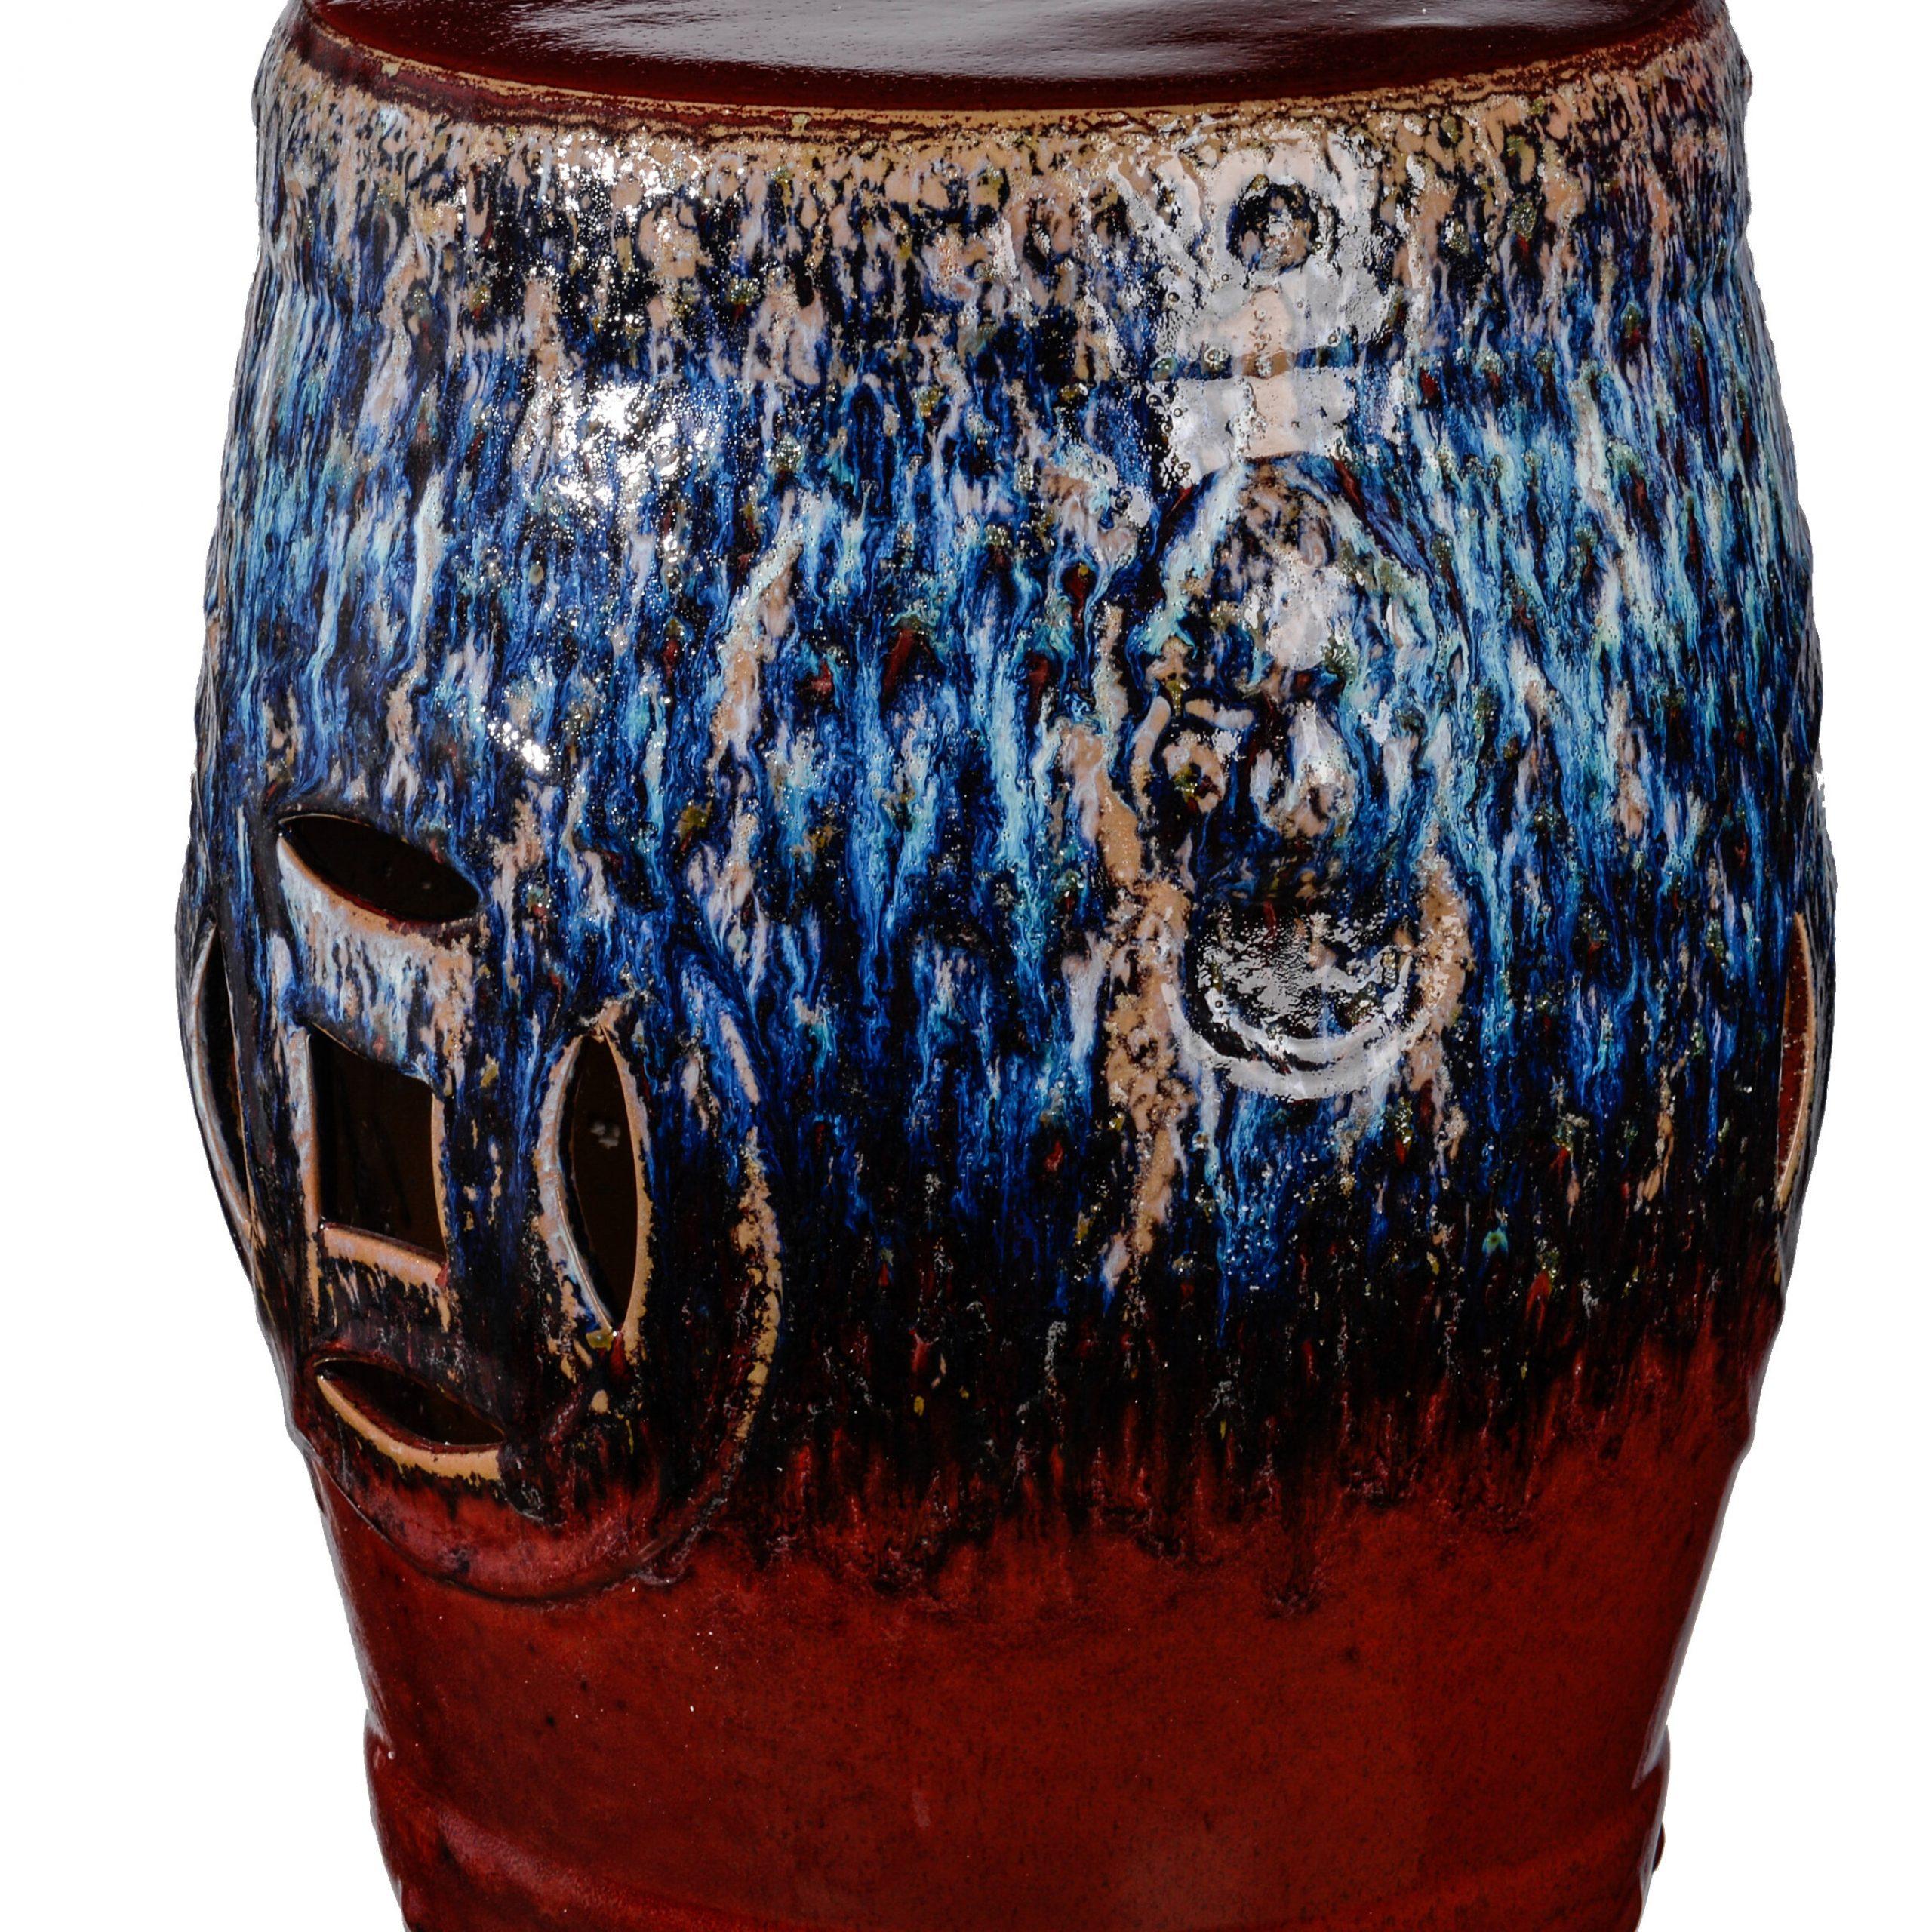 Cates Ceramic Garden Stool With Regard To Wilde Poppies Ceramic Garden Stools (View 9 of 25)